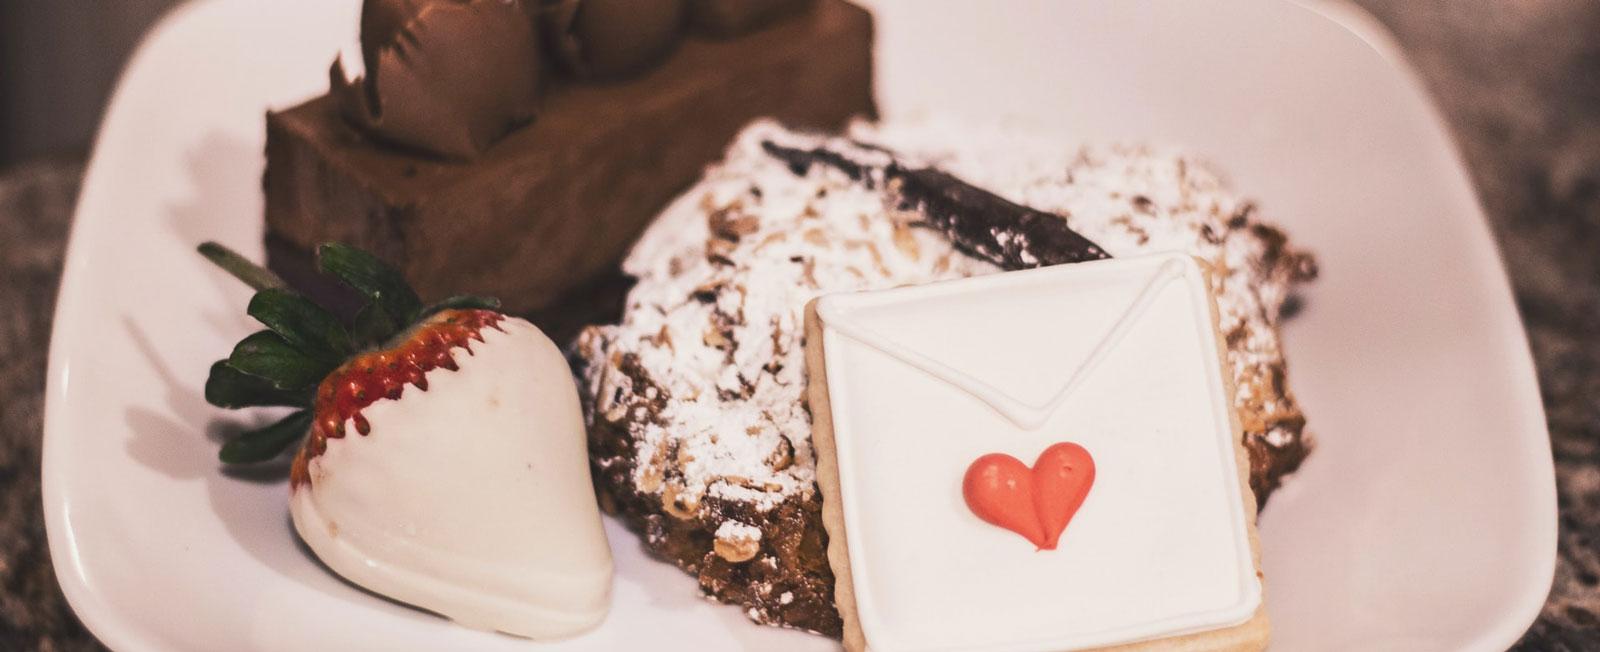 Valentine's Day Workshop: February 11